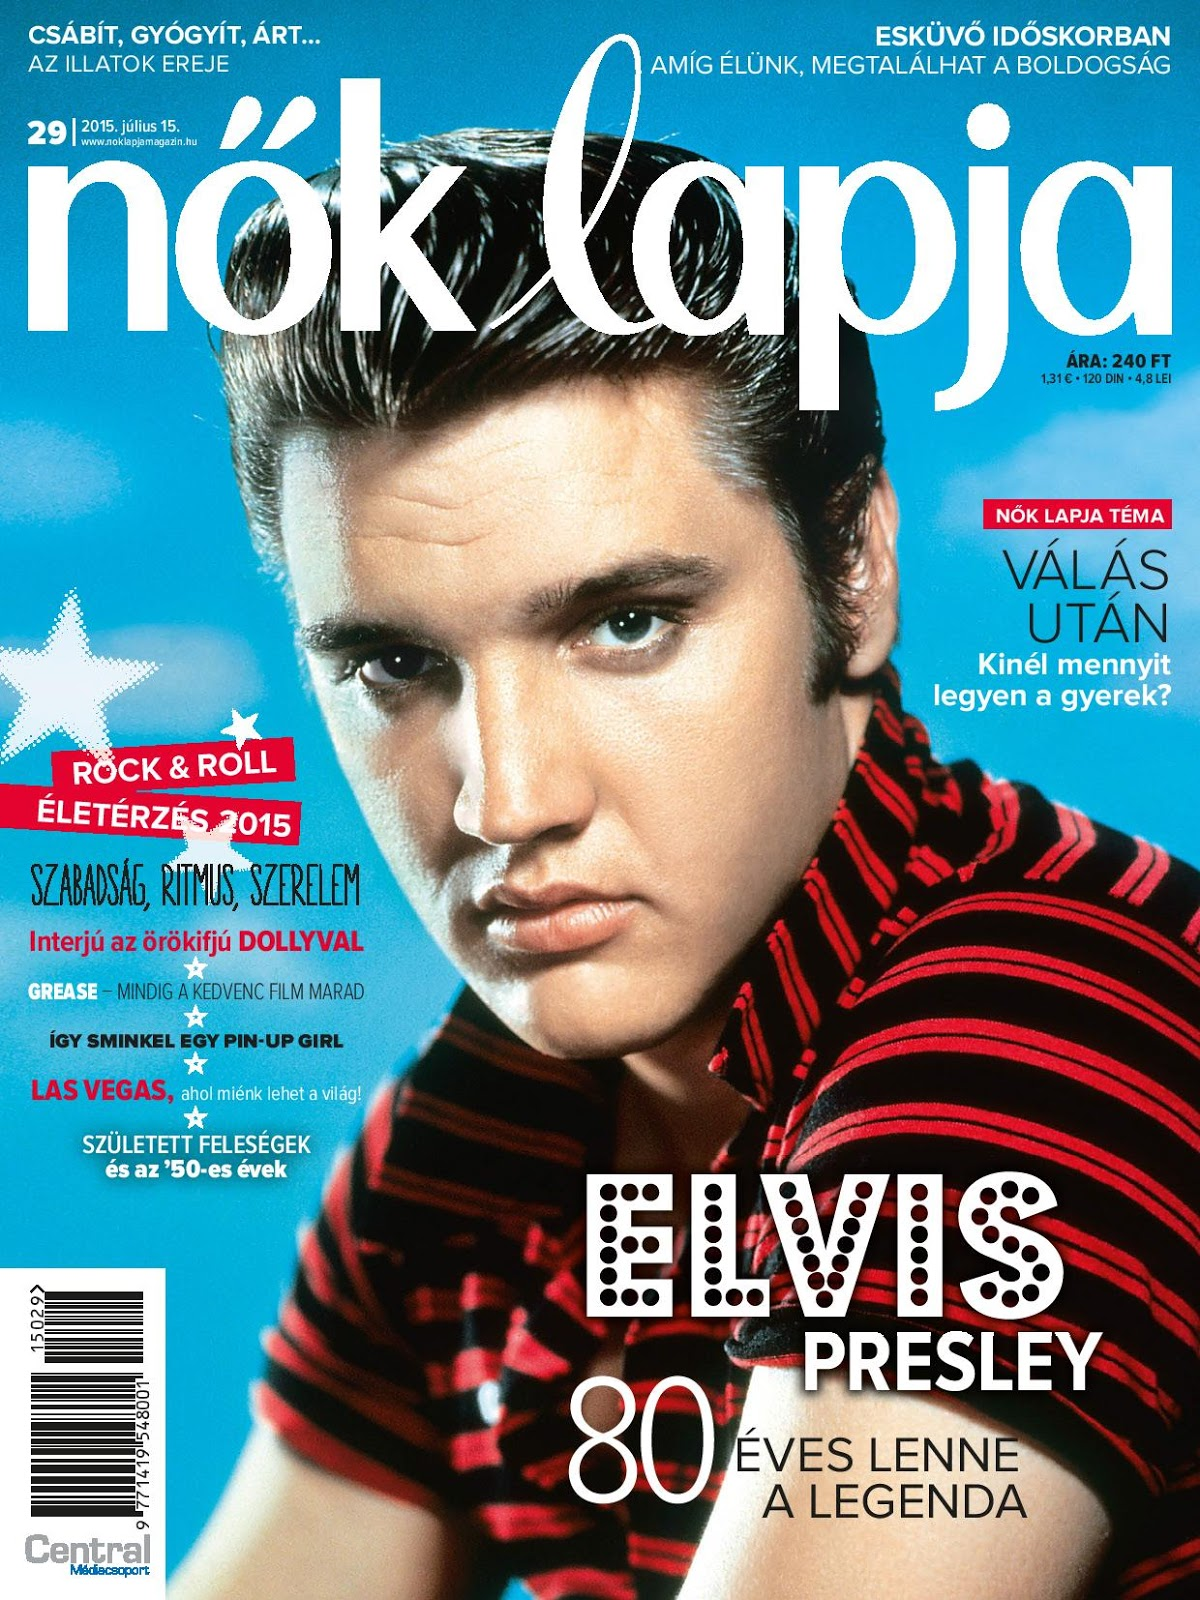 Lisa Marie Says She Felt Elvis Presley's Helping Hand When ...